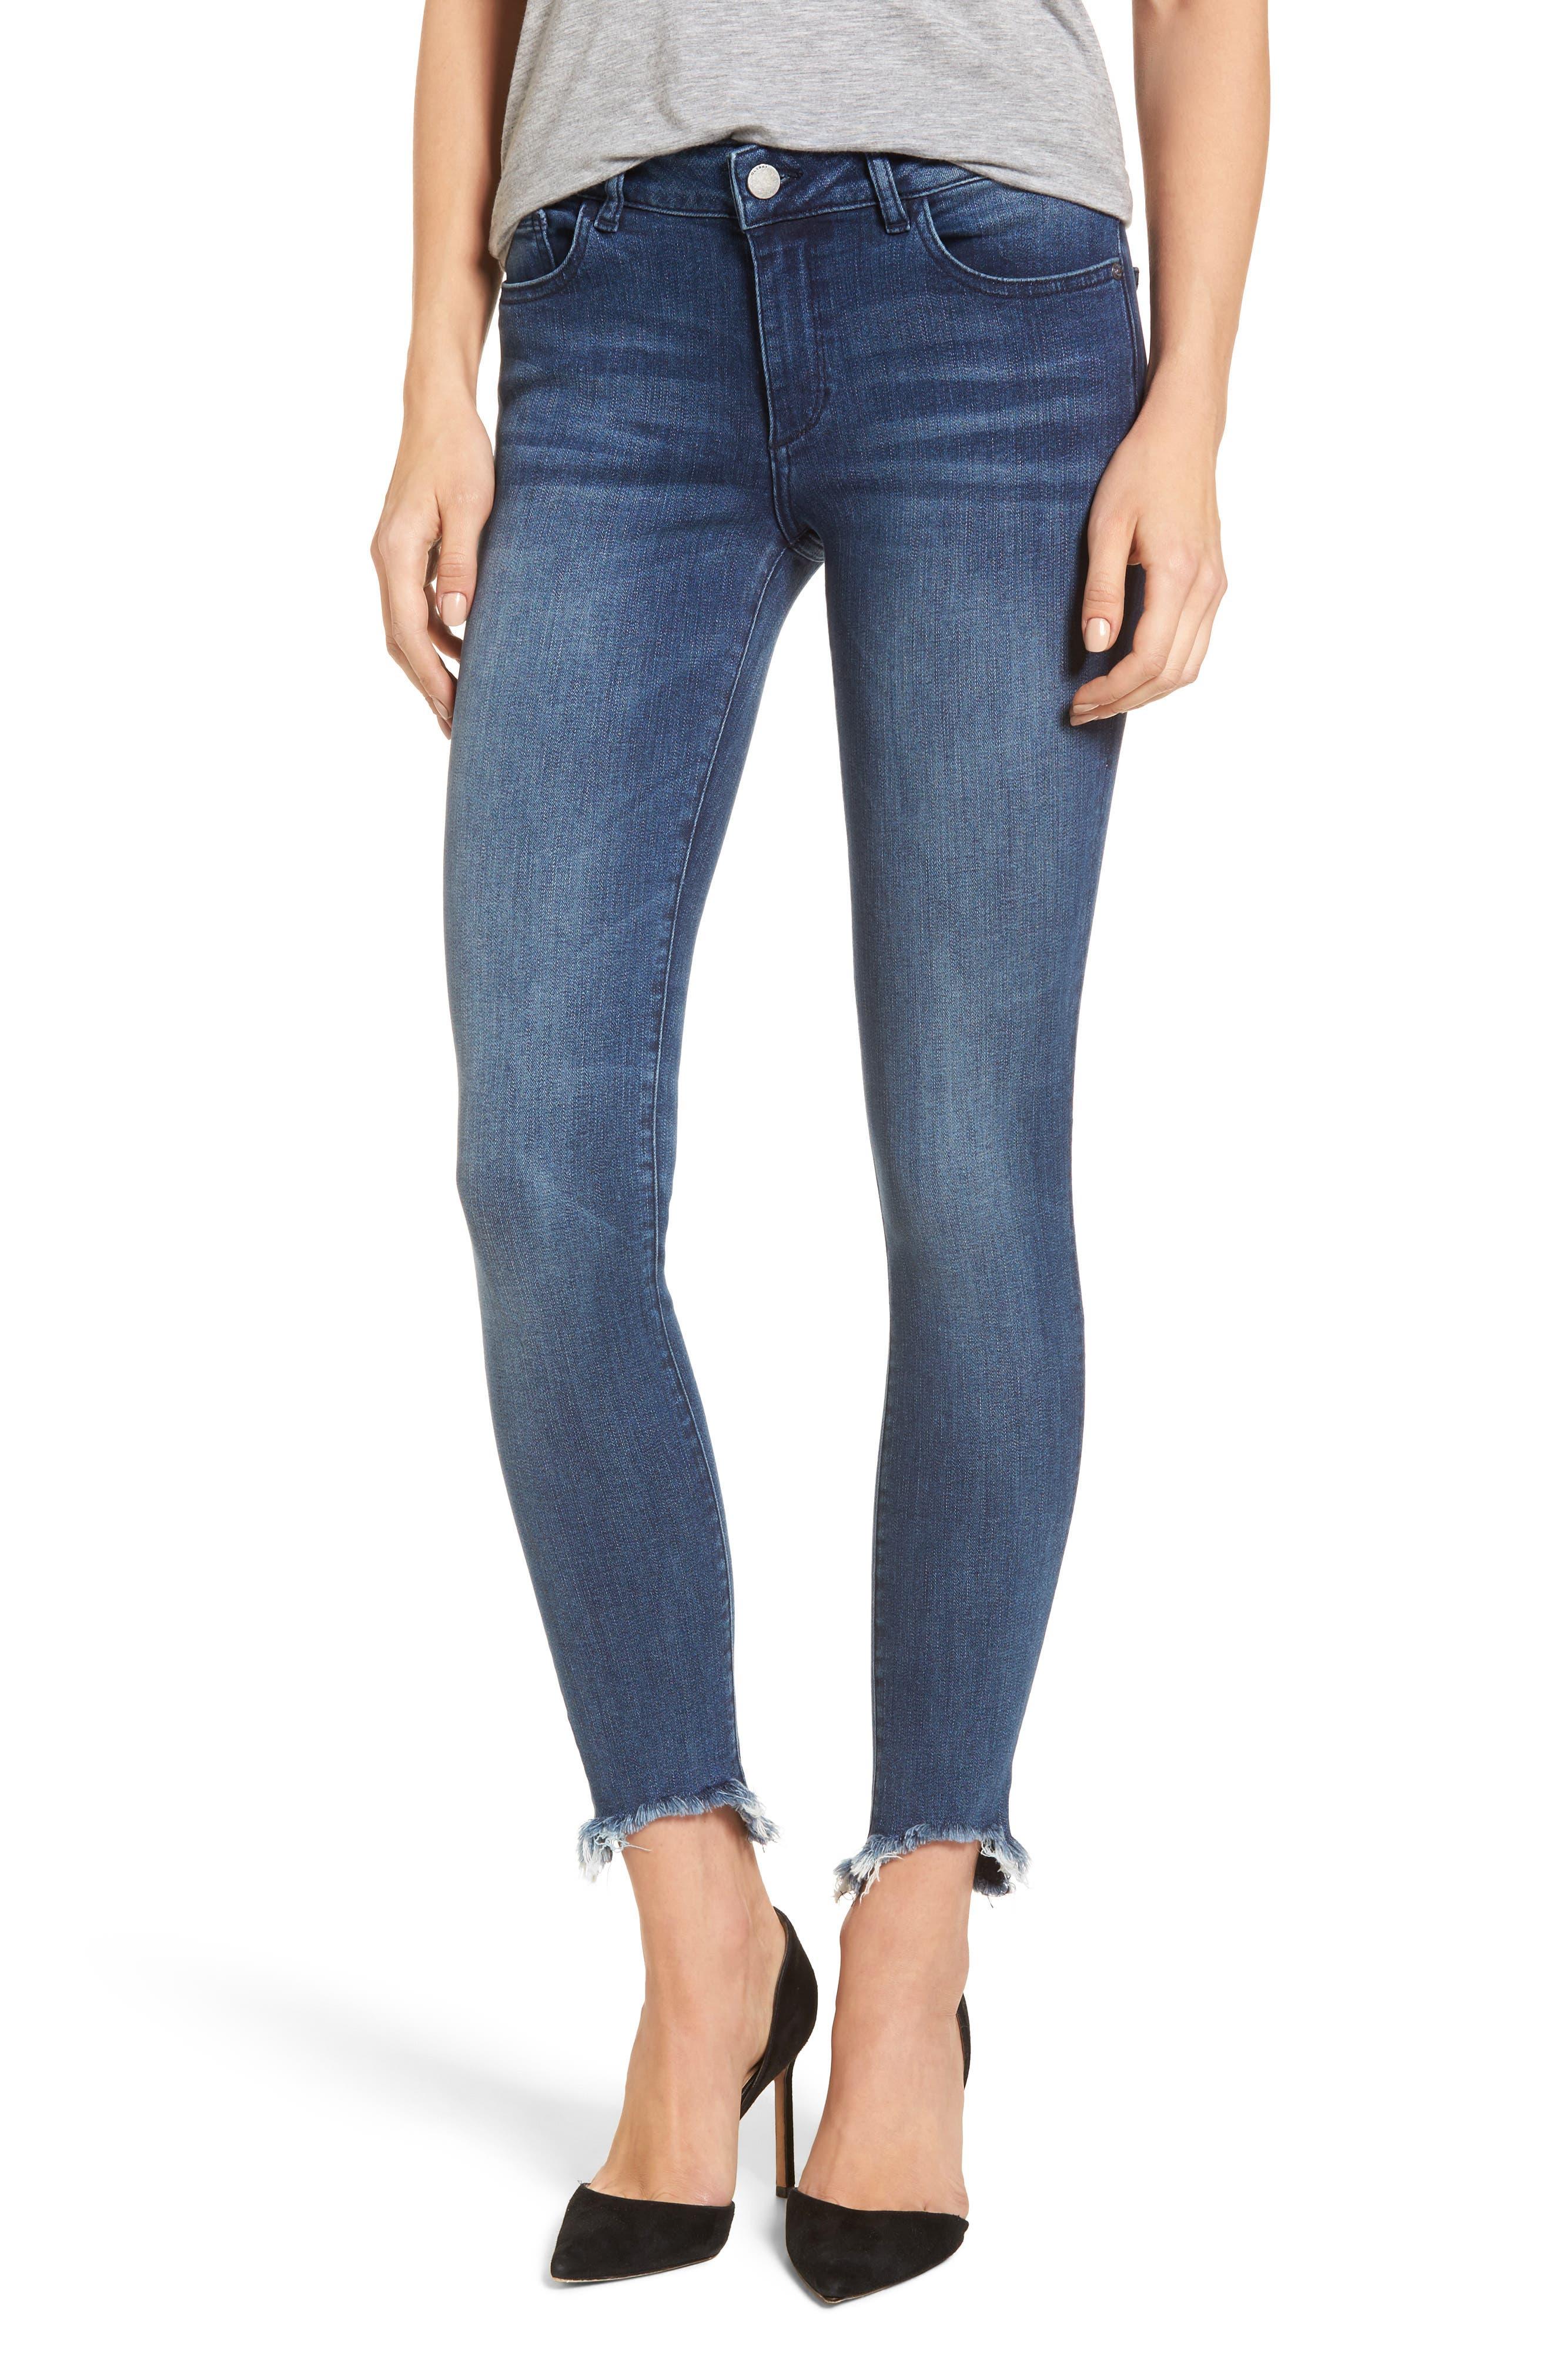 Emma Power Legging Jeans,                         Main,                         color, Fenwick